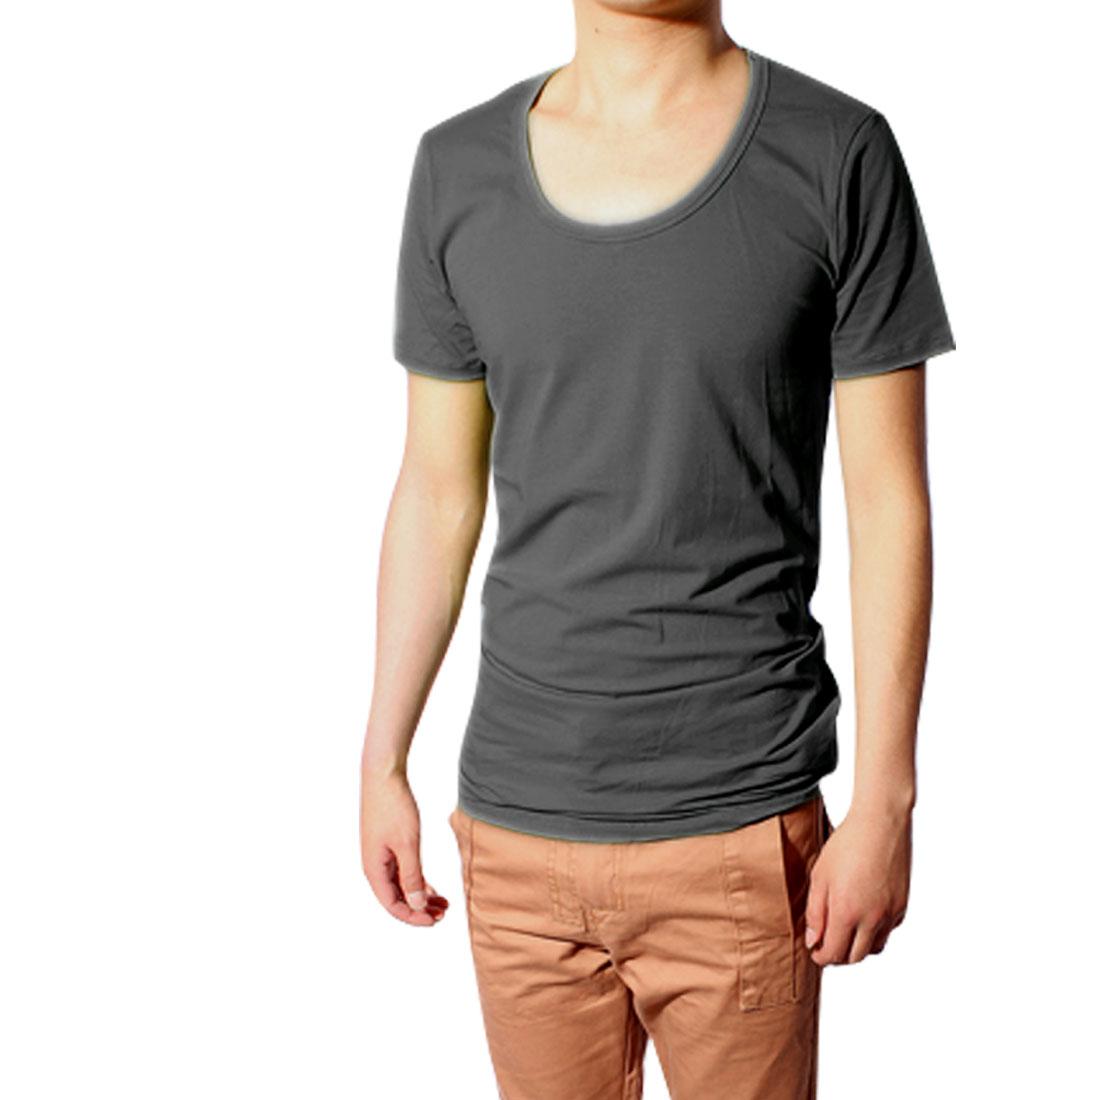 Korea Stylish Scoop Neck Mens Dark Gray Stretch Primer Shirt S